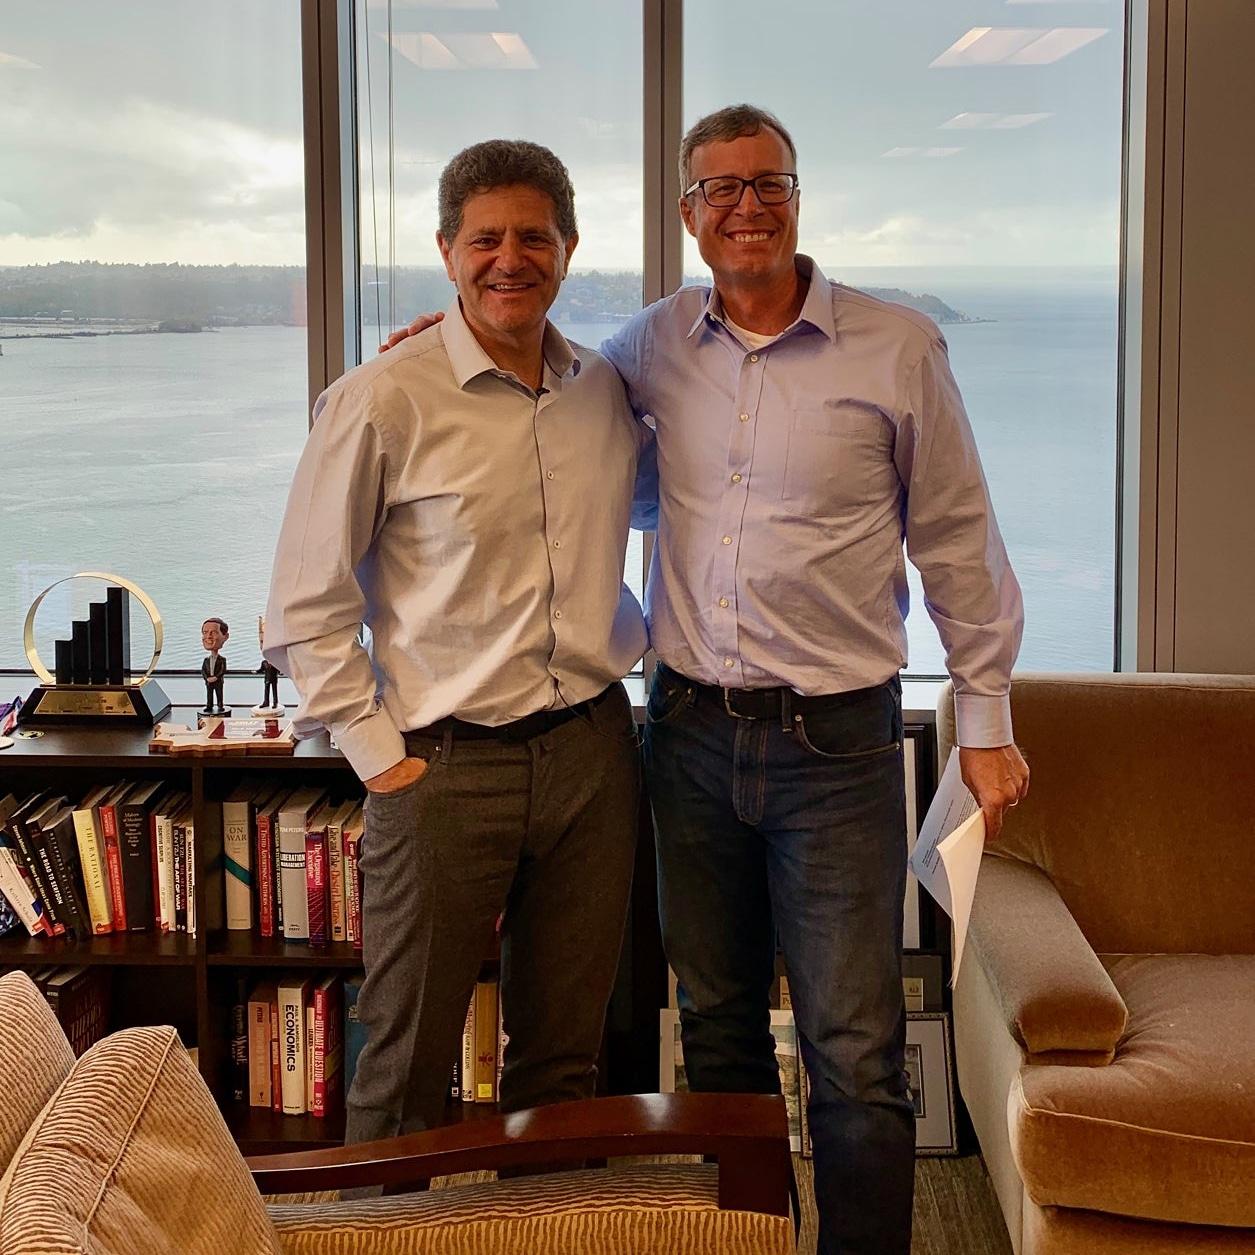 Jeff Mann and Nick Hanauer